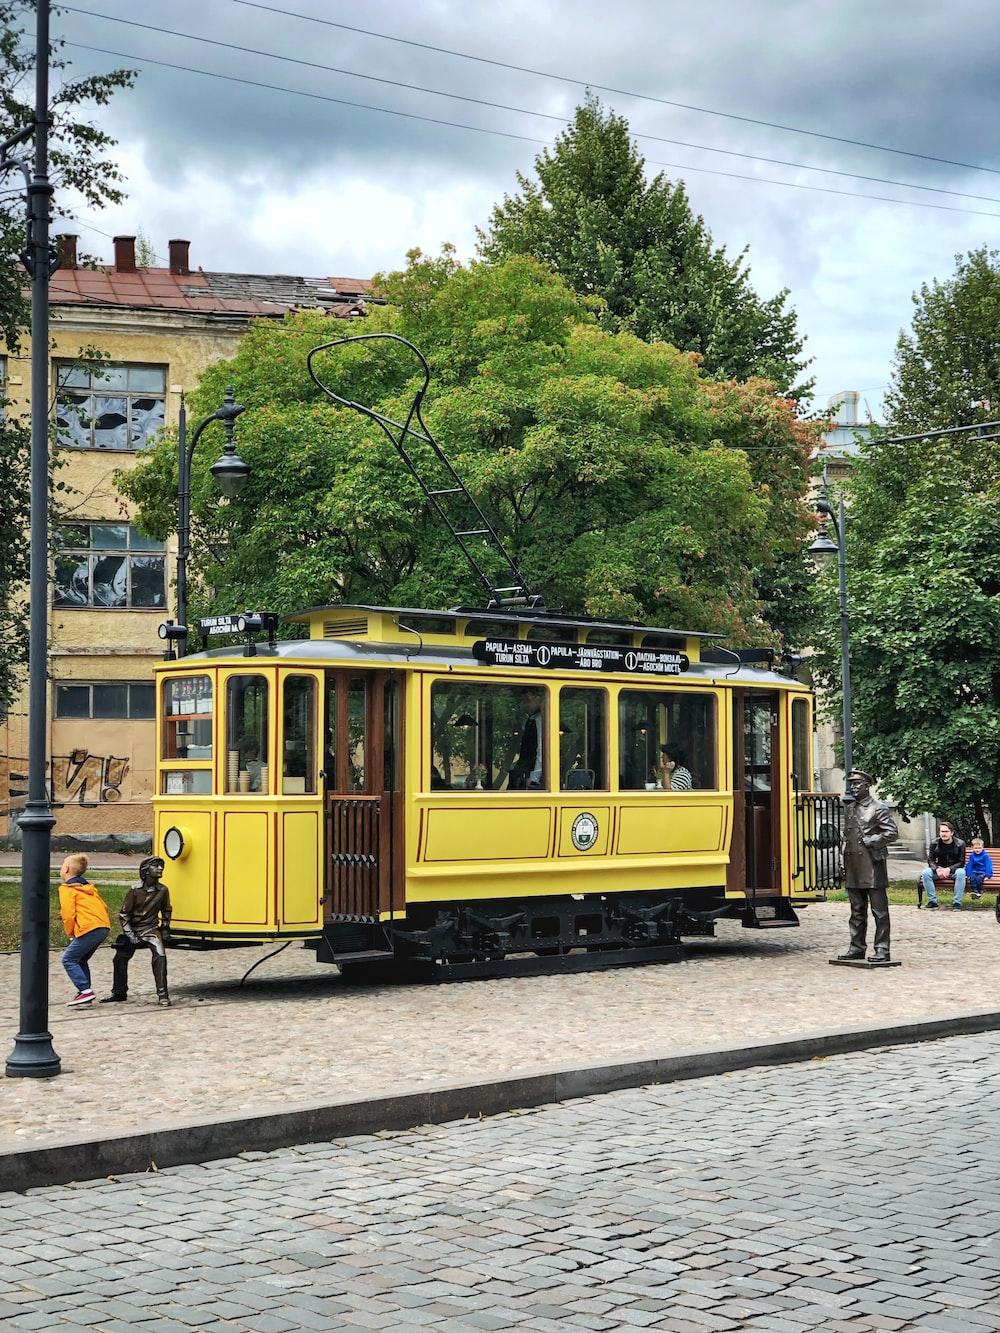 three statues beside yellow tram during daytime